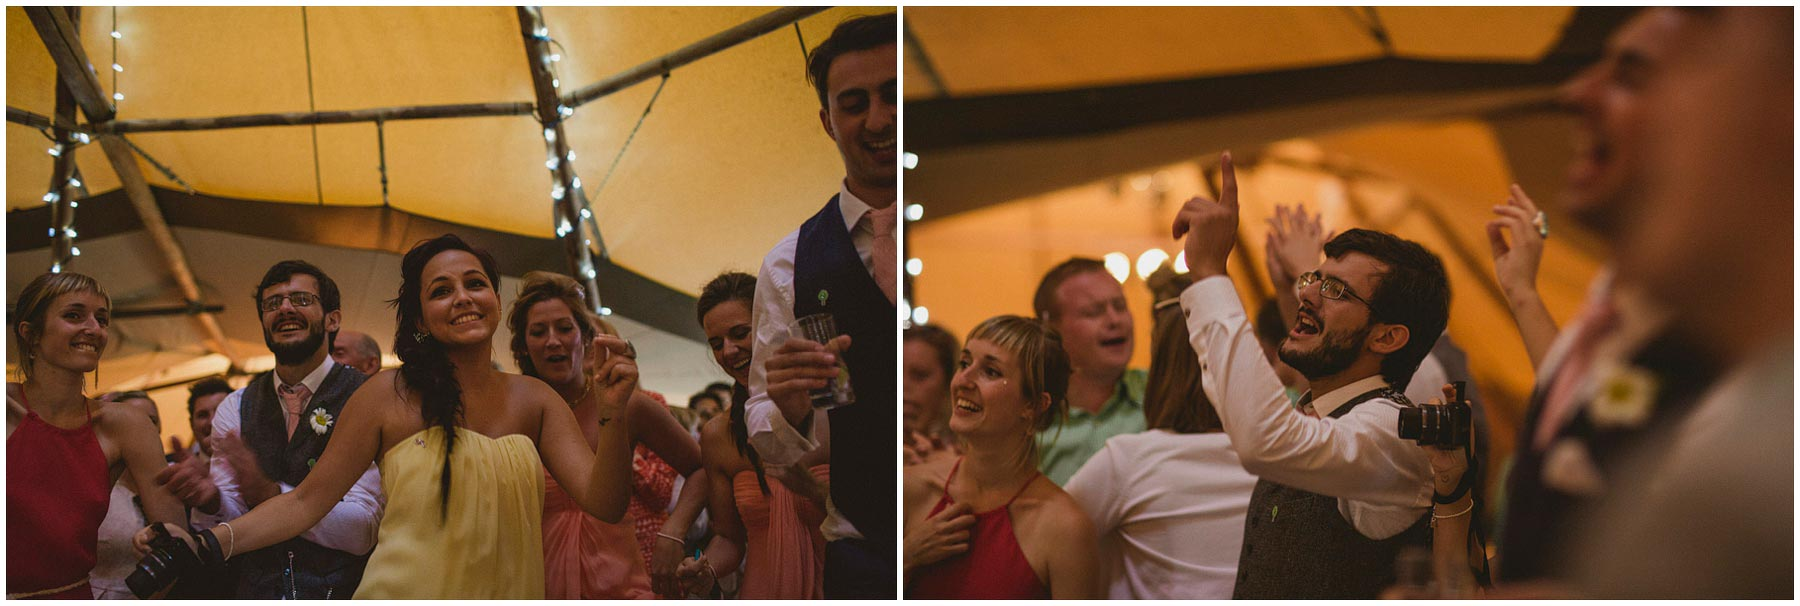 Kent-Festival-Tipi-wedding-photography_0165